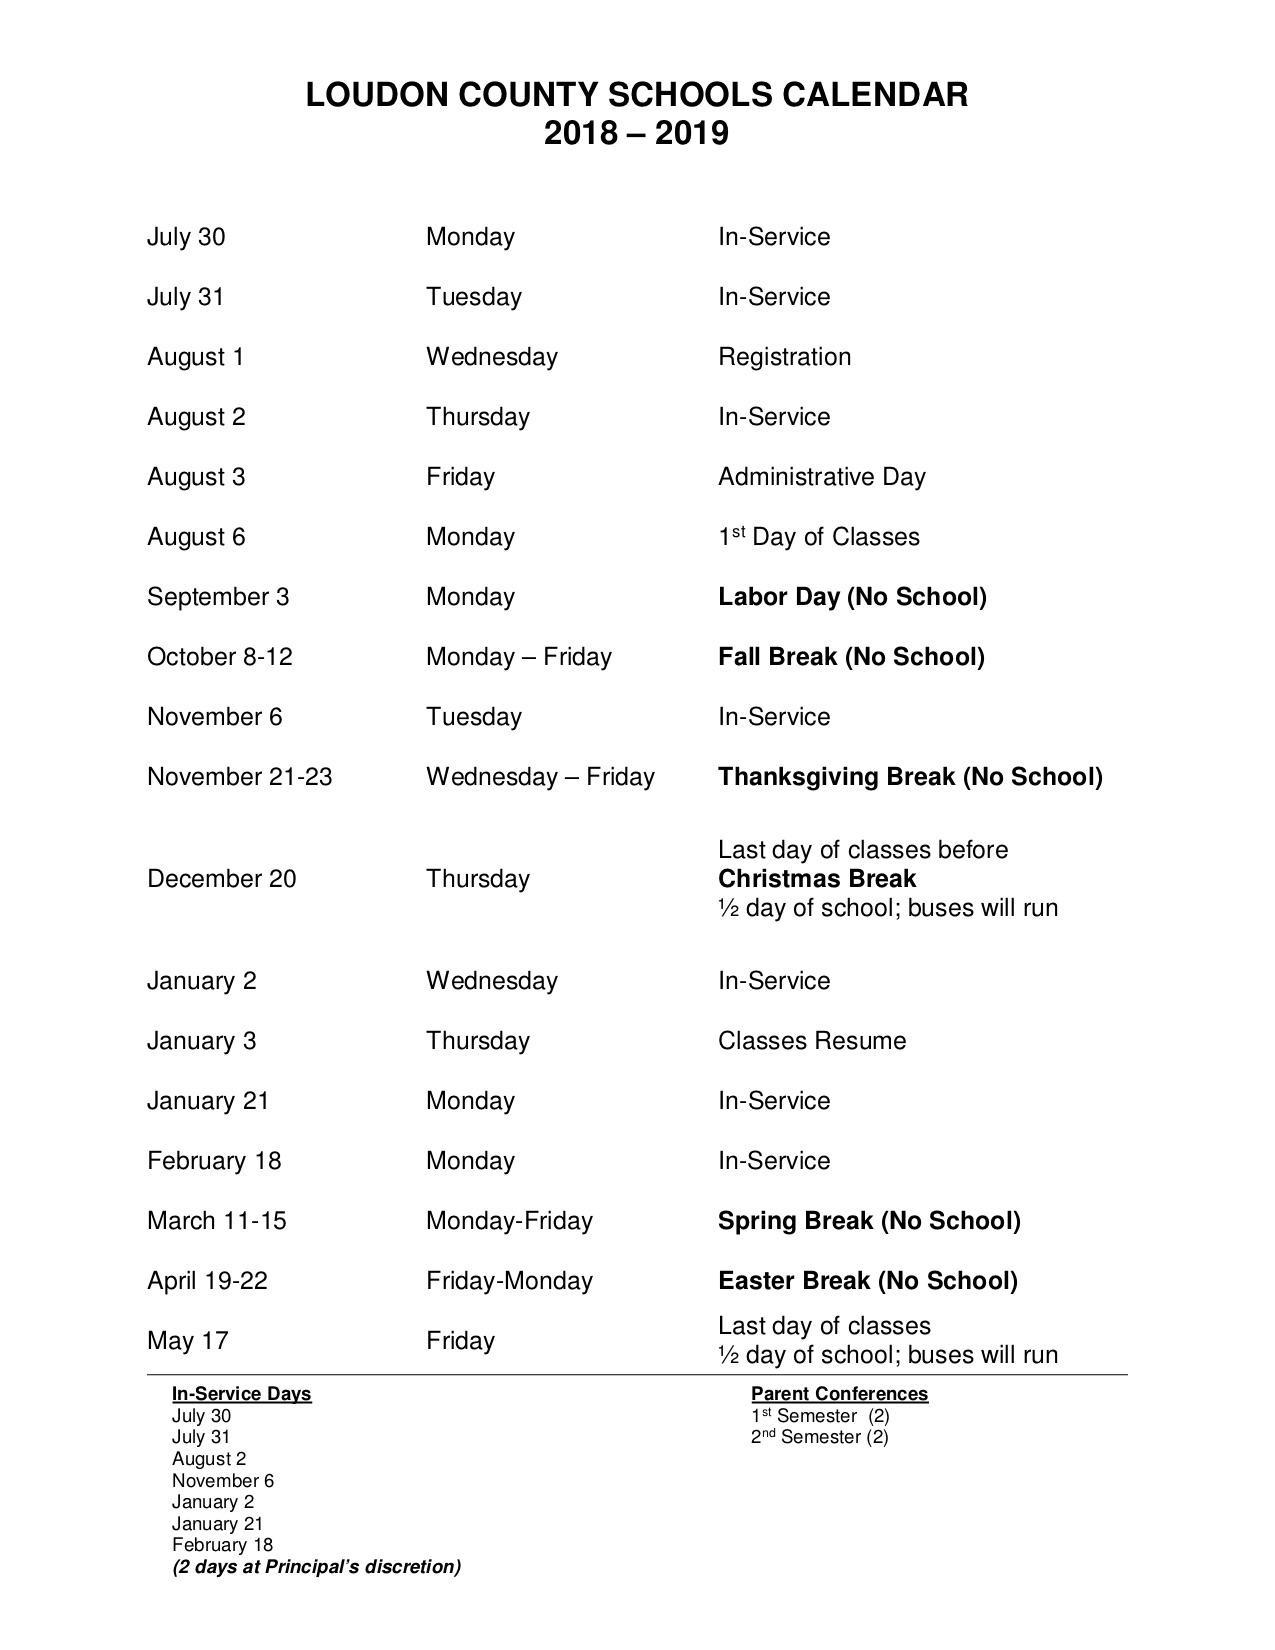 Philadelphia Elementary School_School Calendar Loudoun County